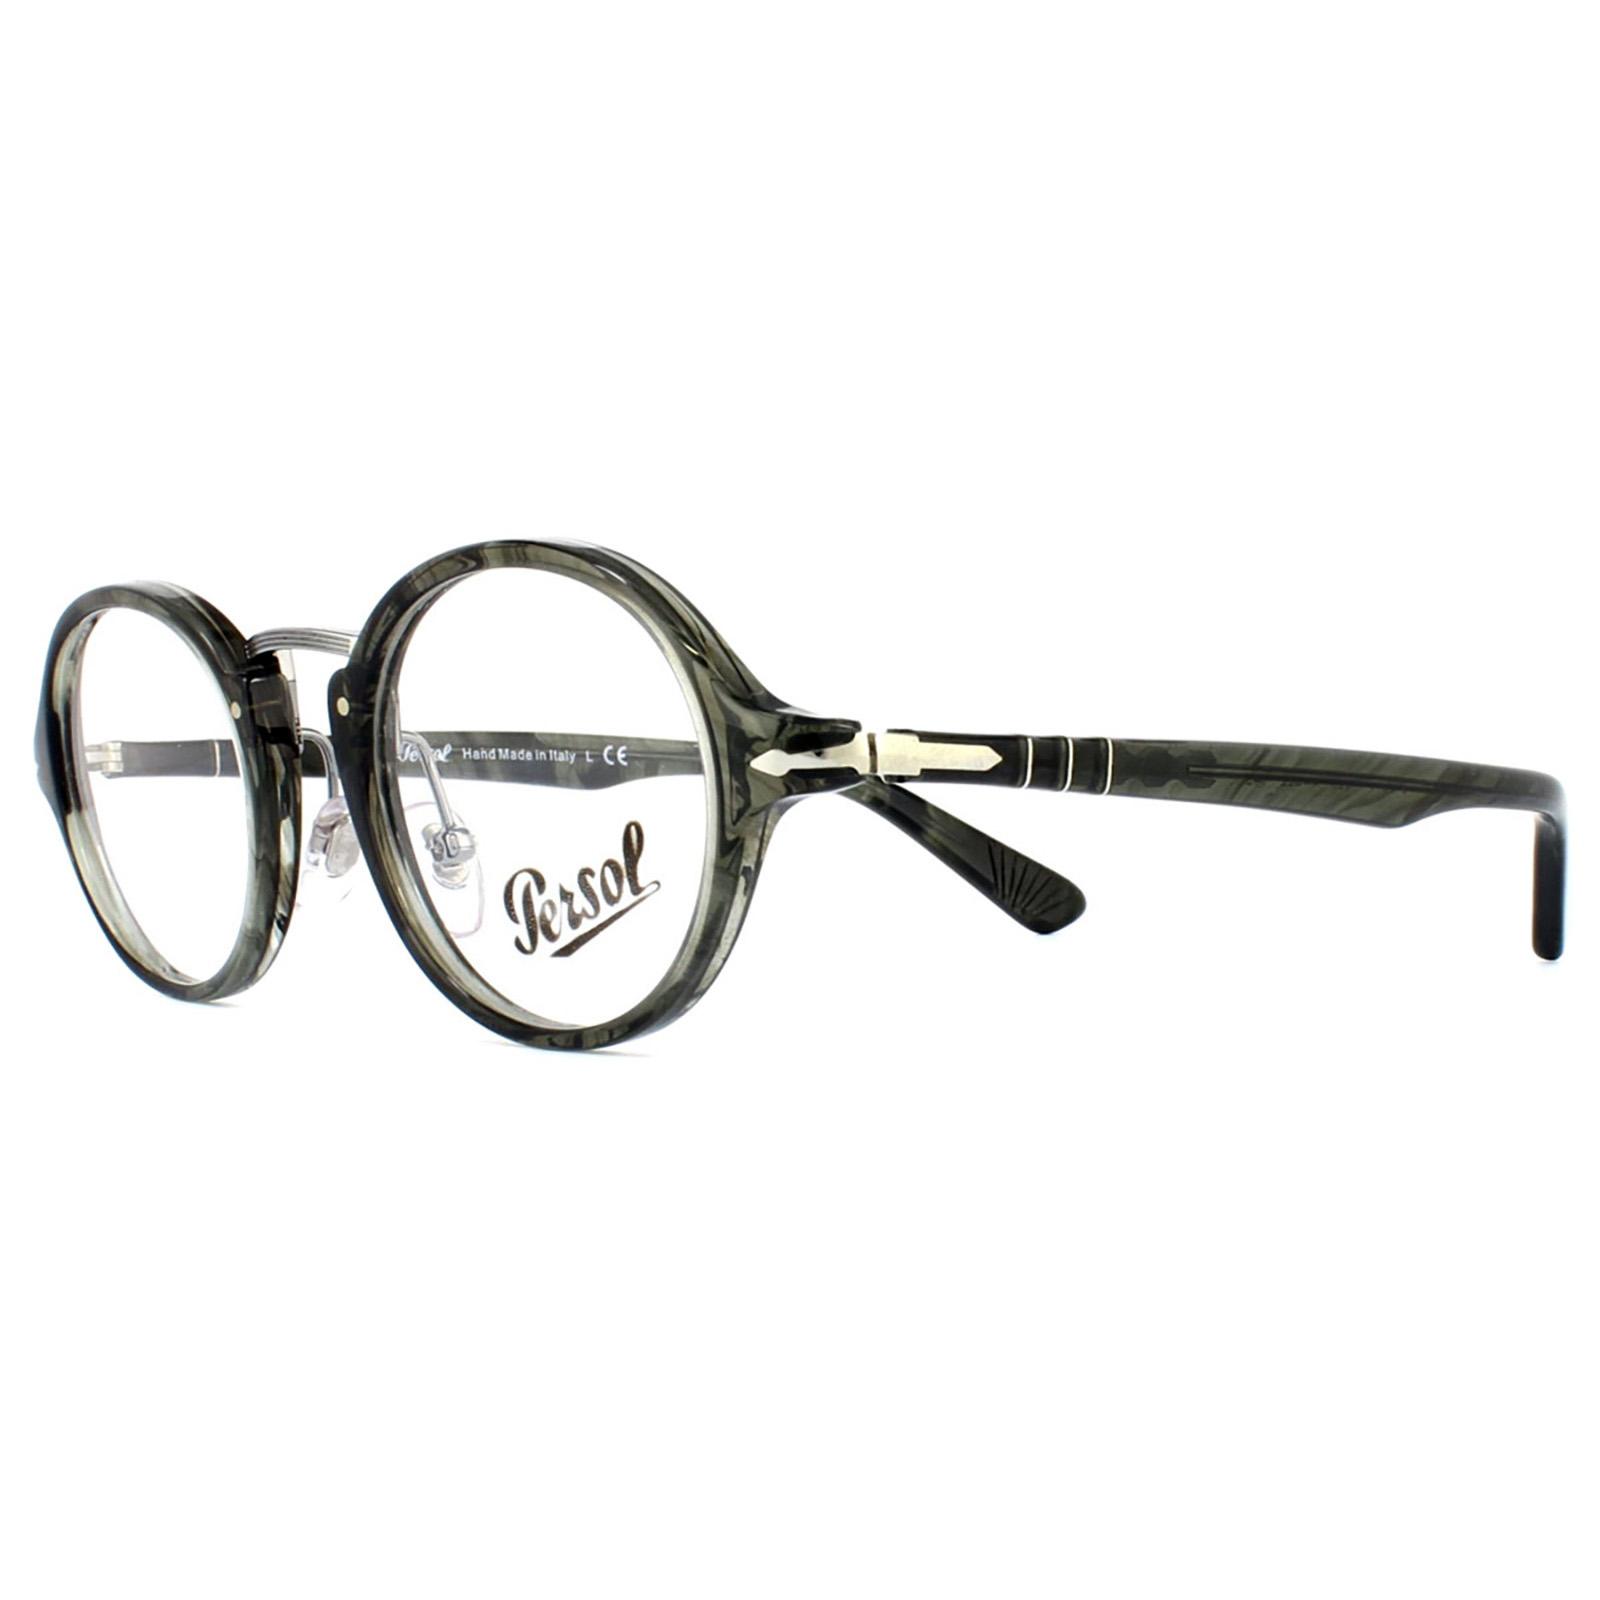 8ae3a3035540 Sentinel Persol Glasses Frames 3128V 1020 Striped Grey Mens Womens 46mm